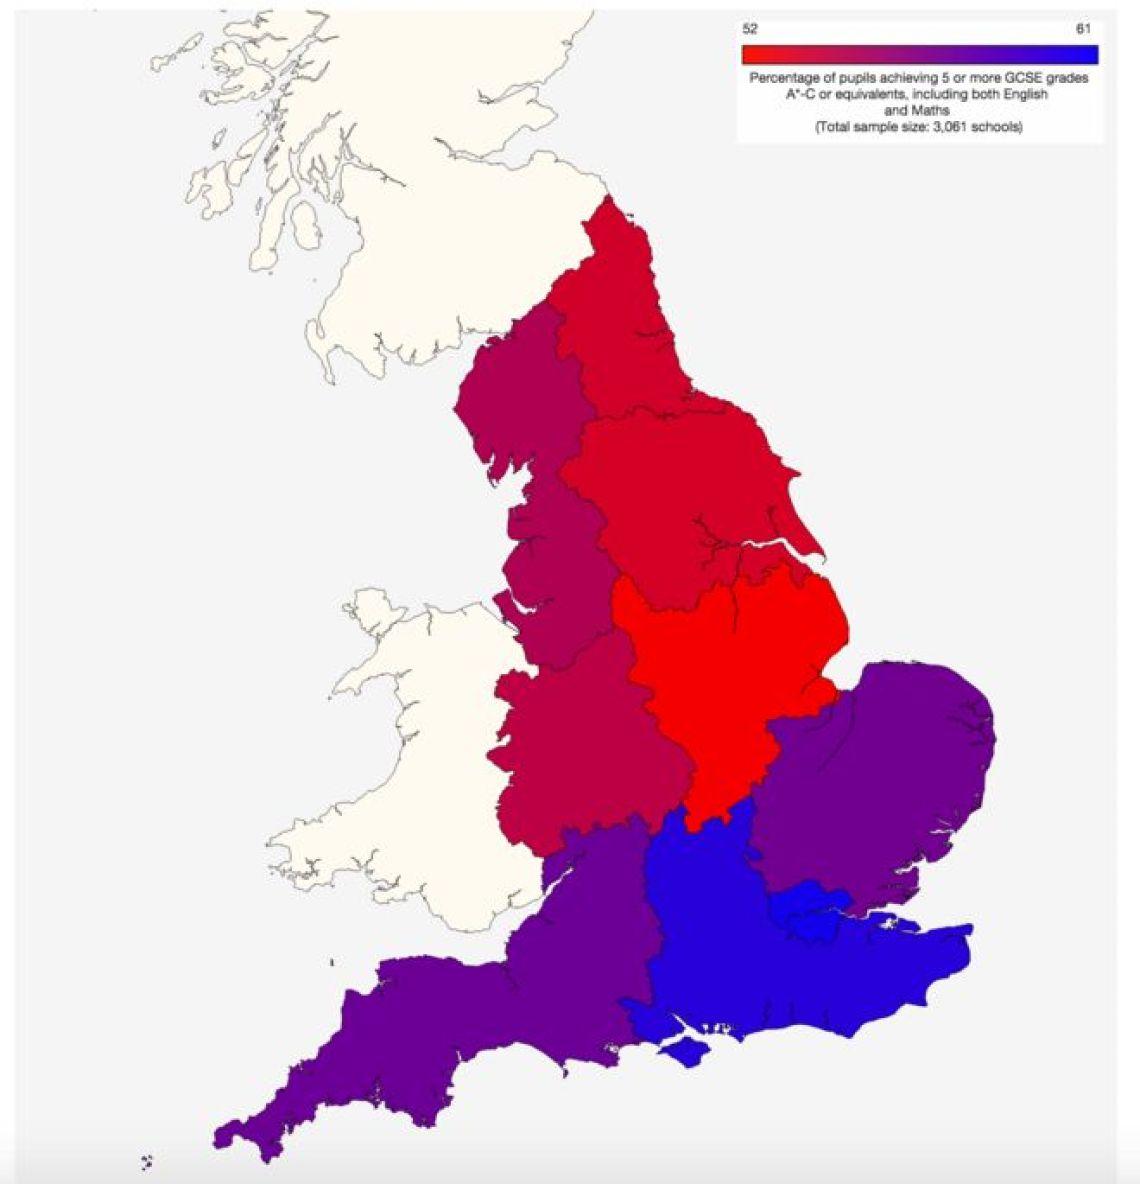 2015 GCSE results